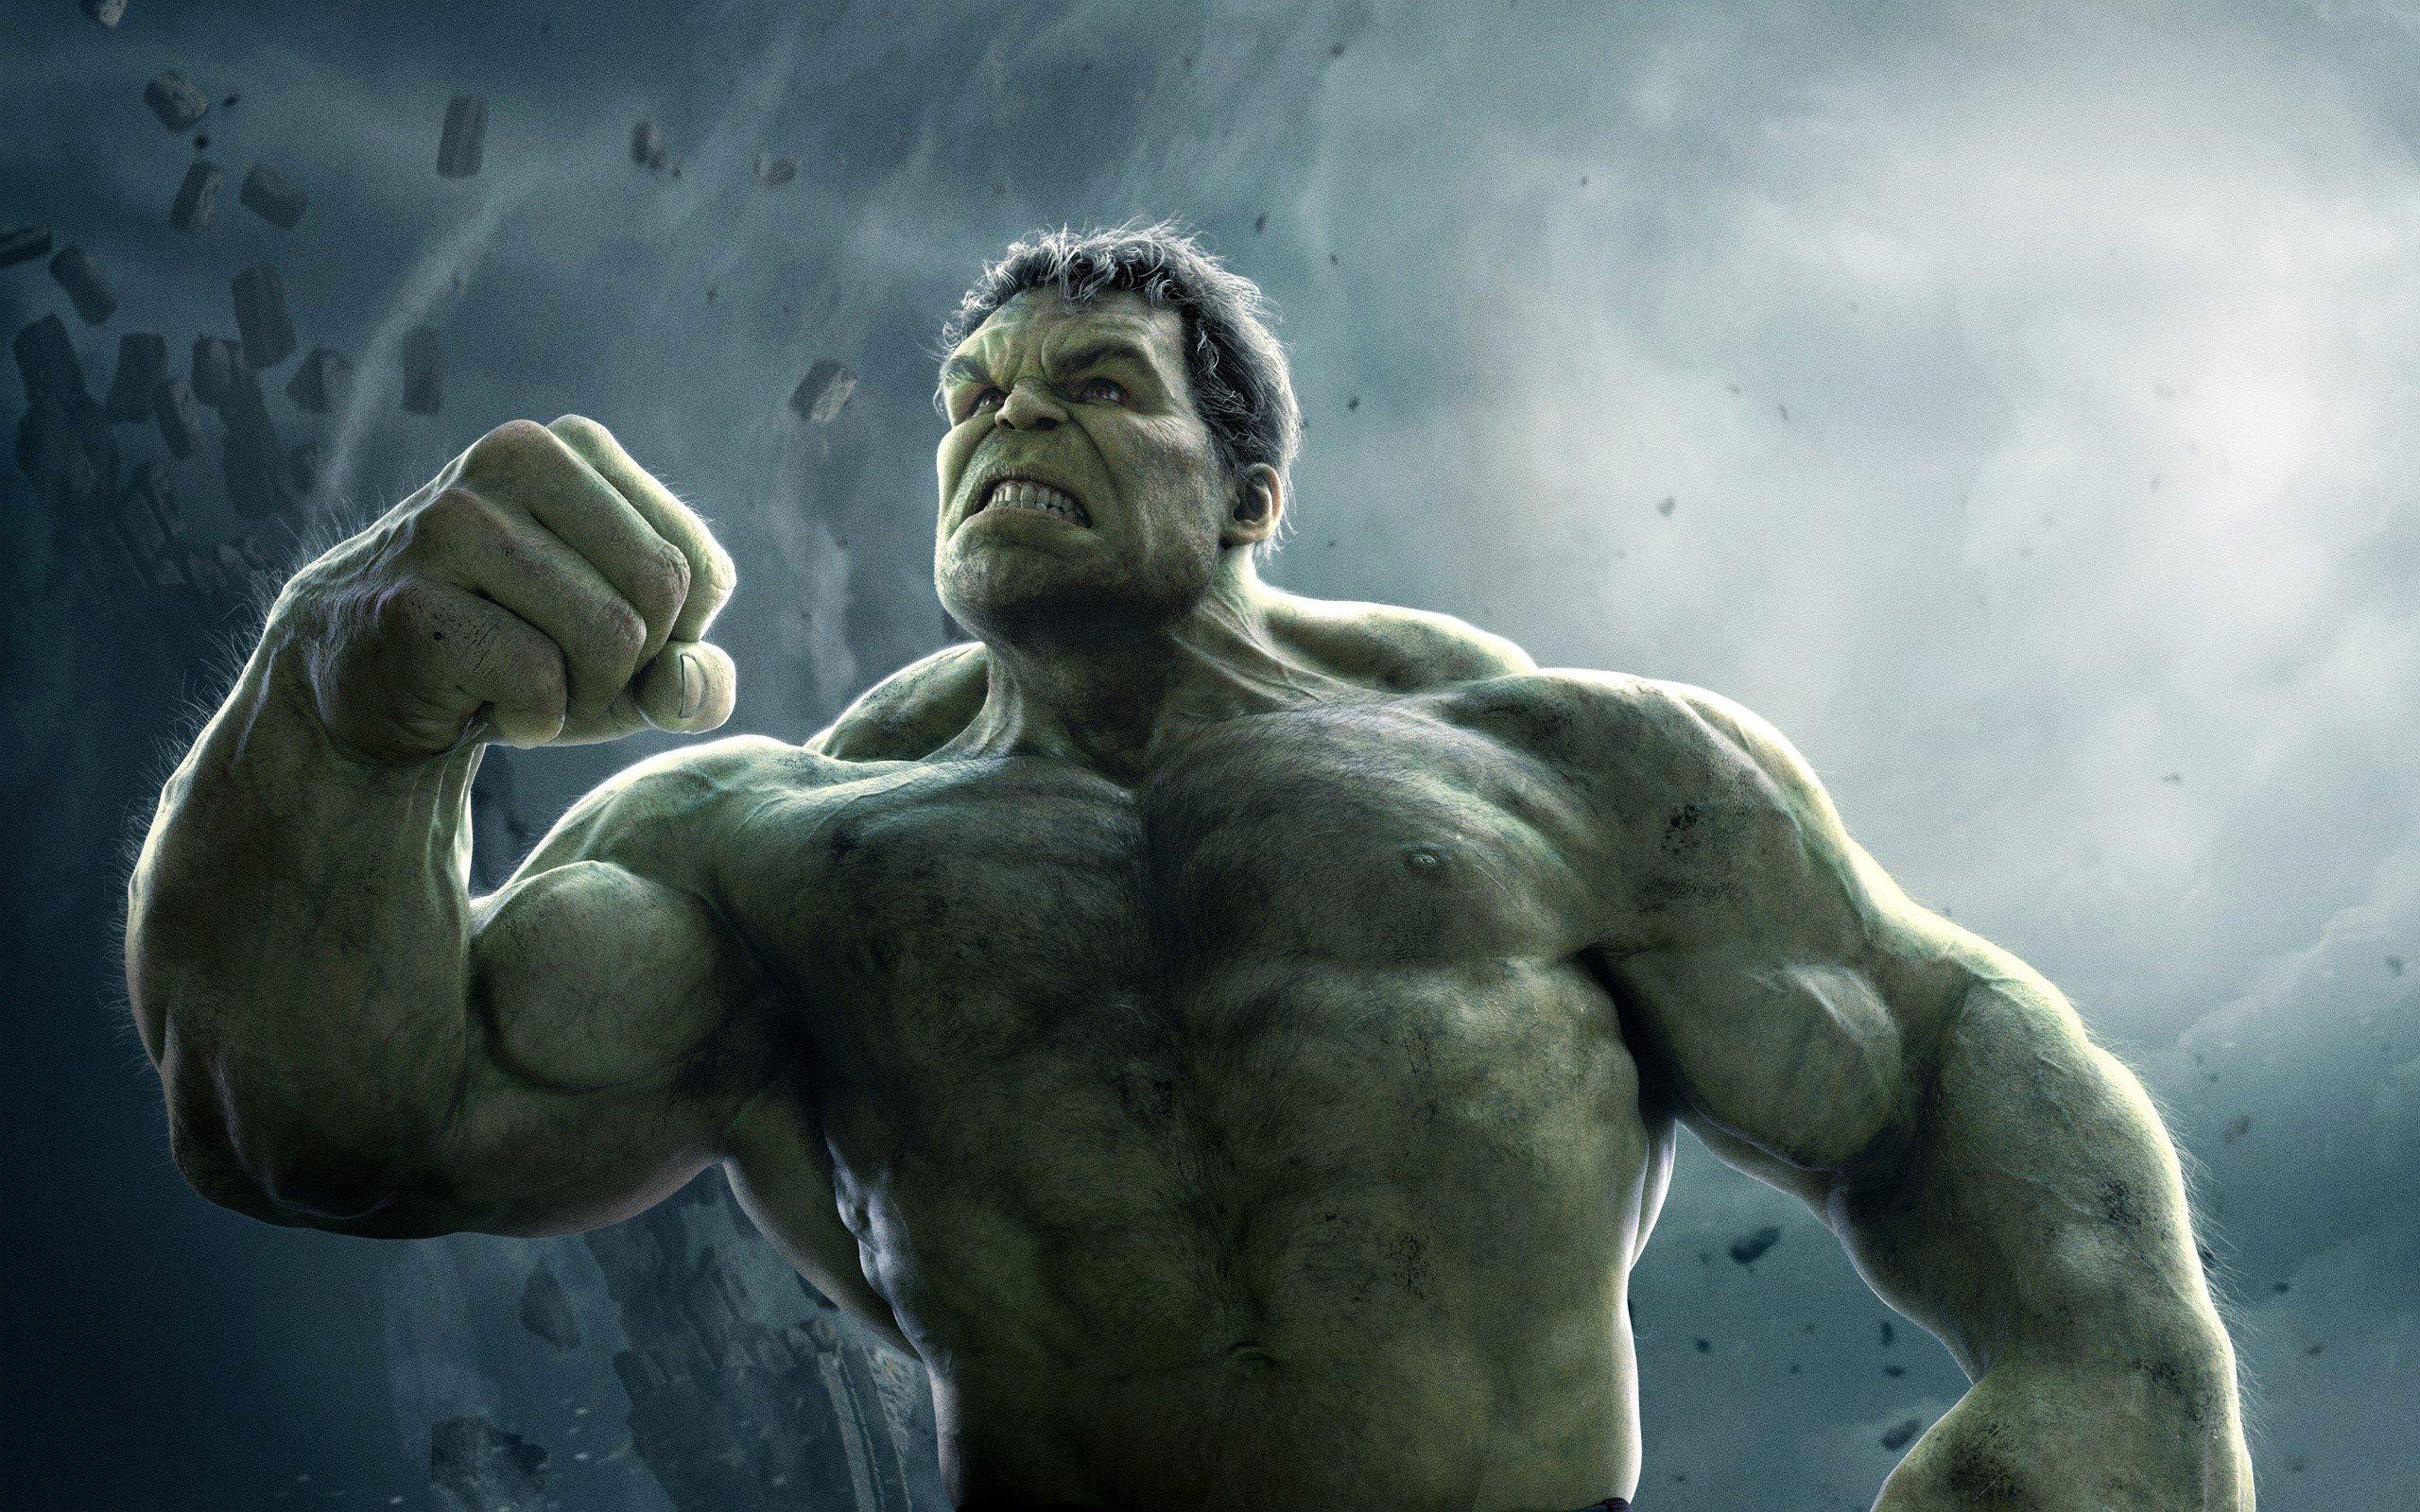 Wallpaper Hulk in Avengers Age of Ultron